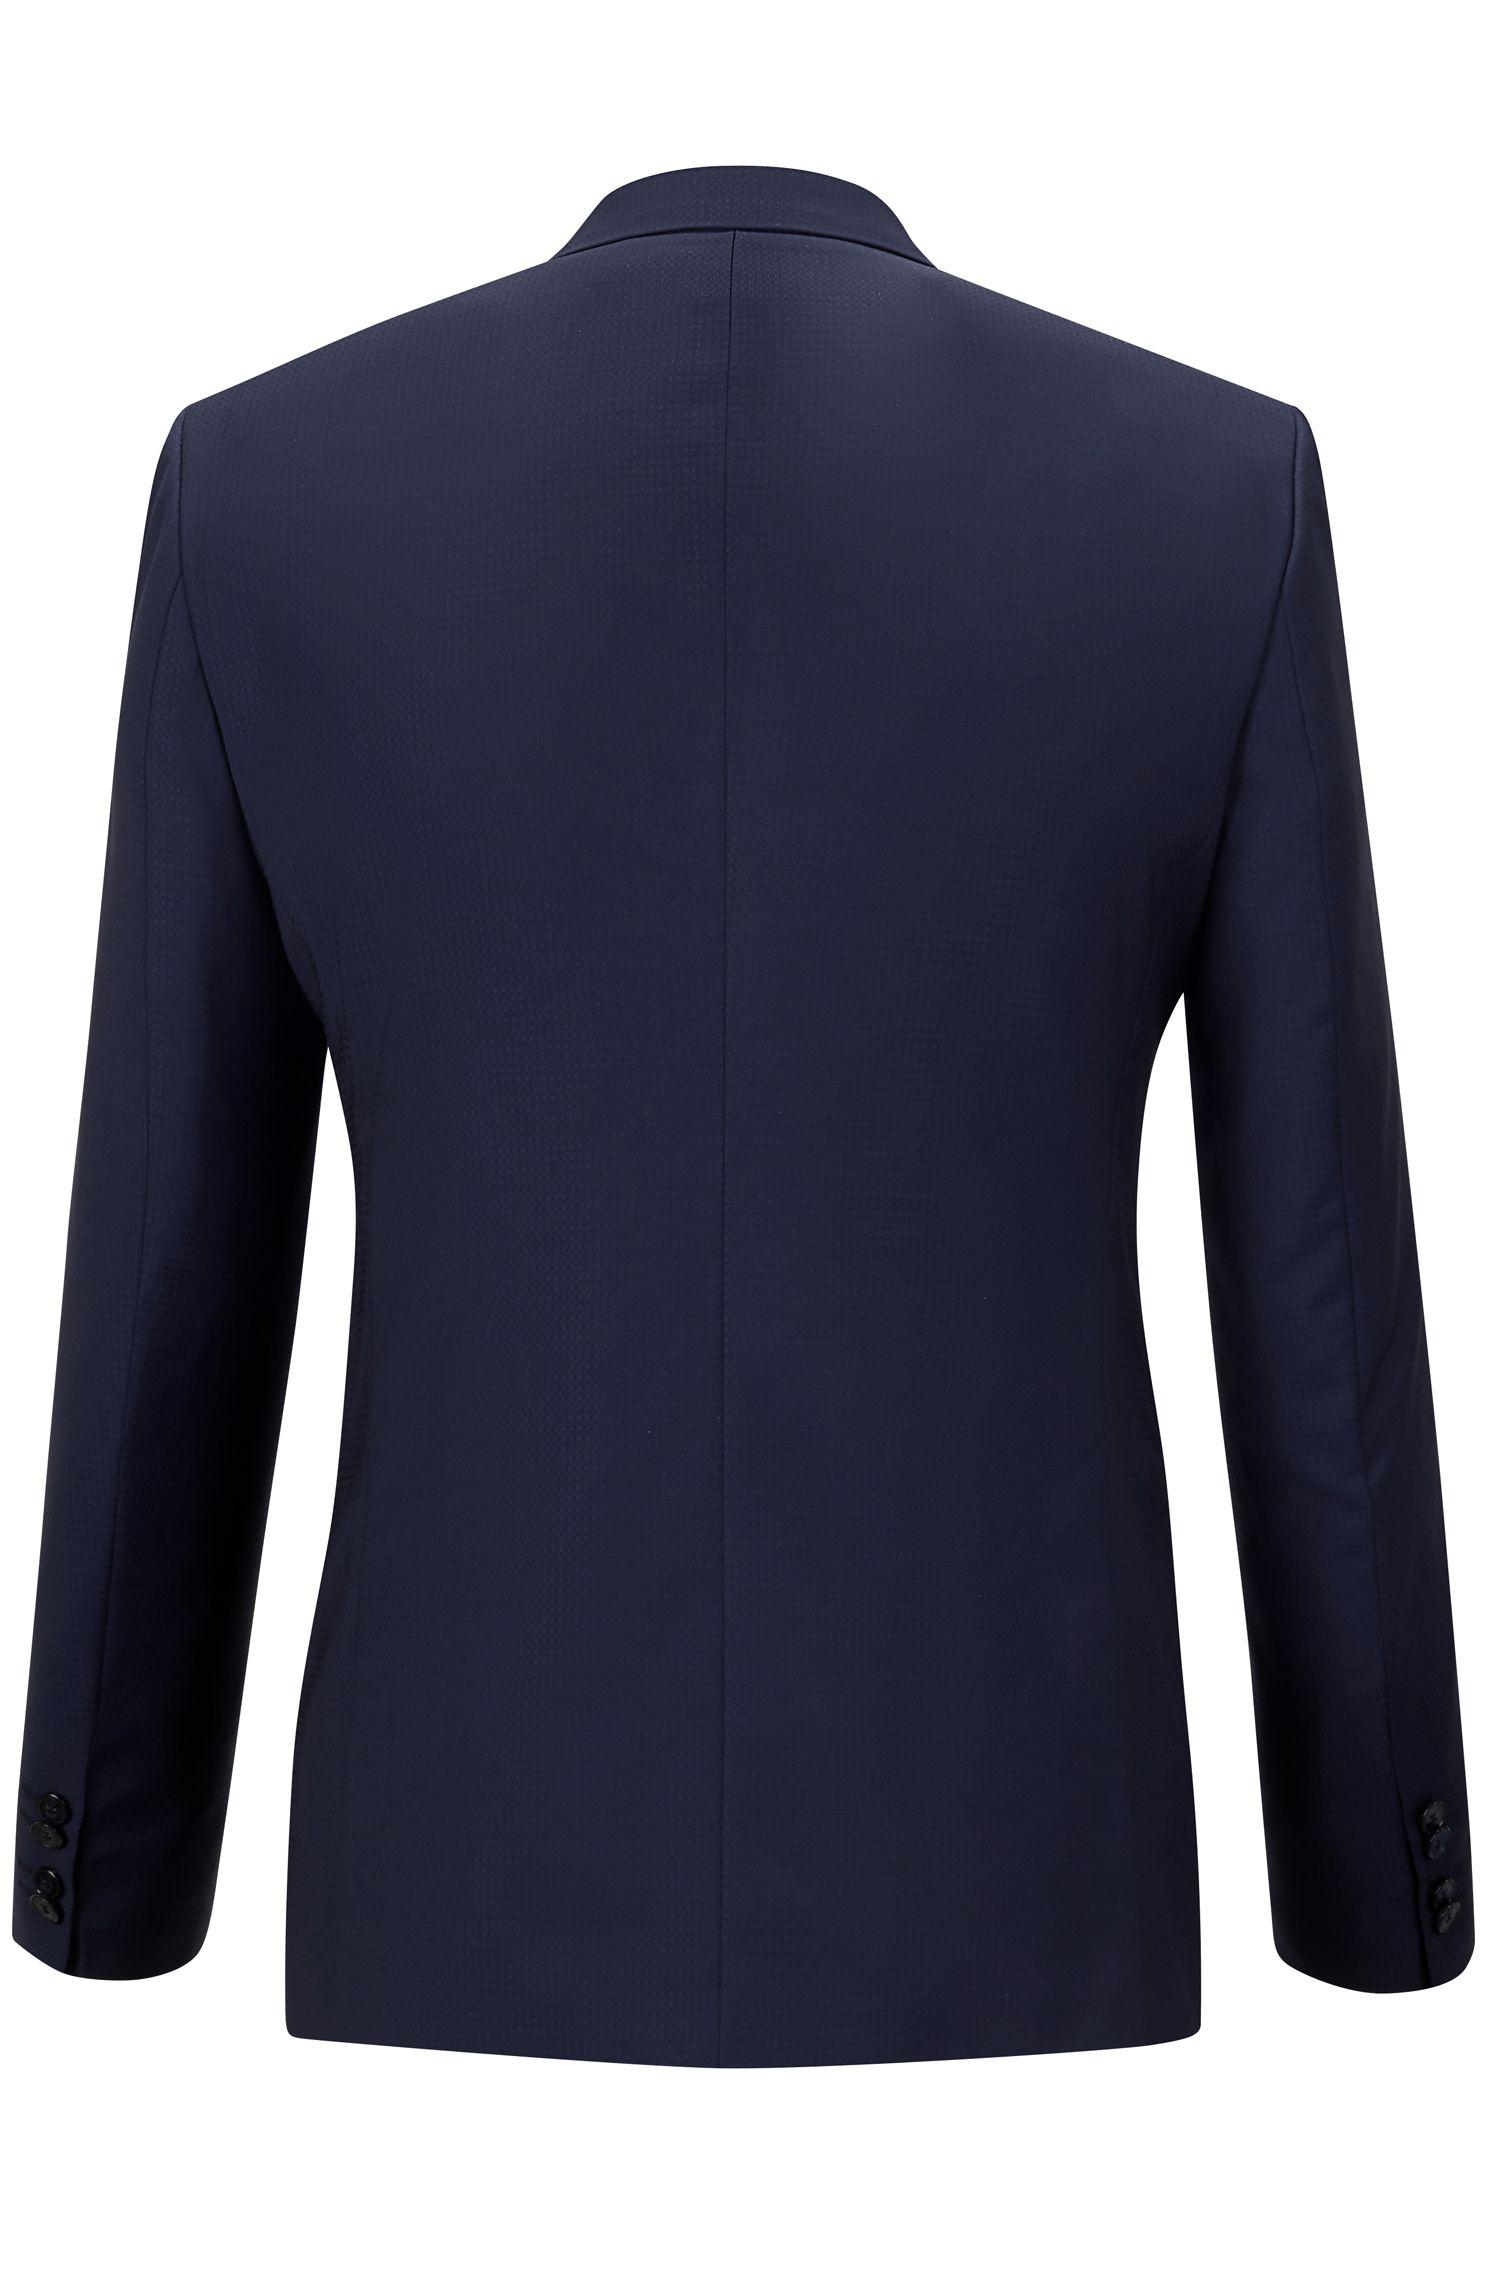 Italian Virgin Wool Suit, Slim Fit | Adgin/Hiels